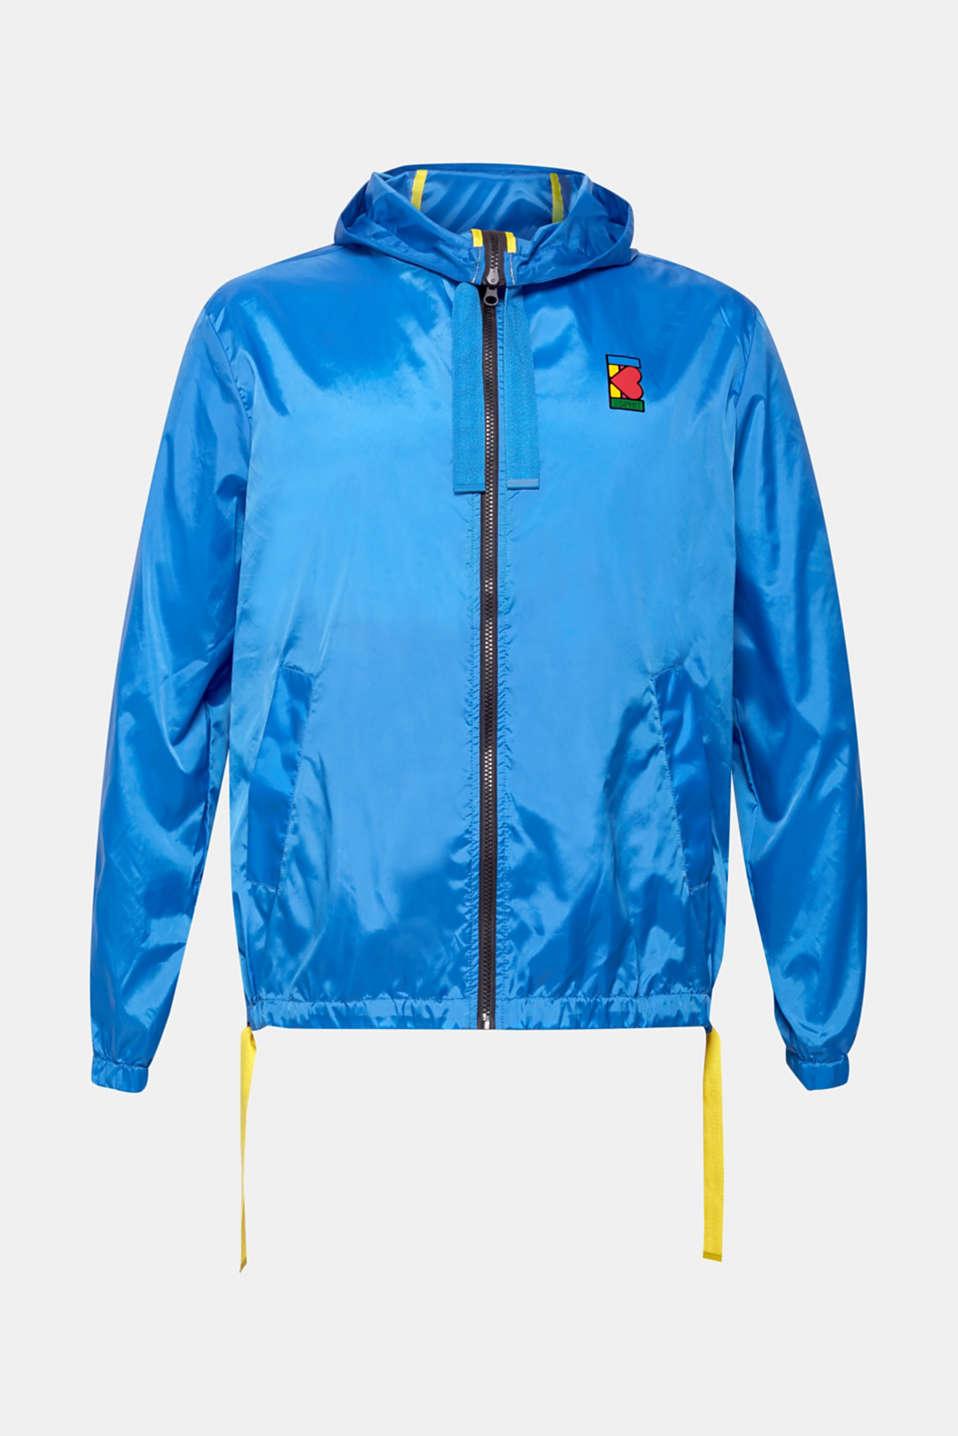 Jackets indoor knitted, BLUE, detail image number 7